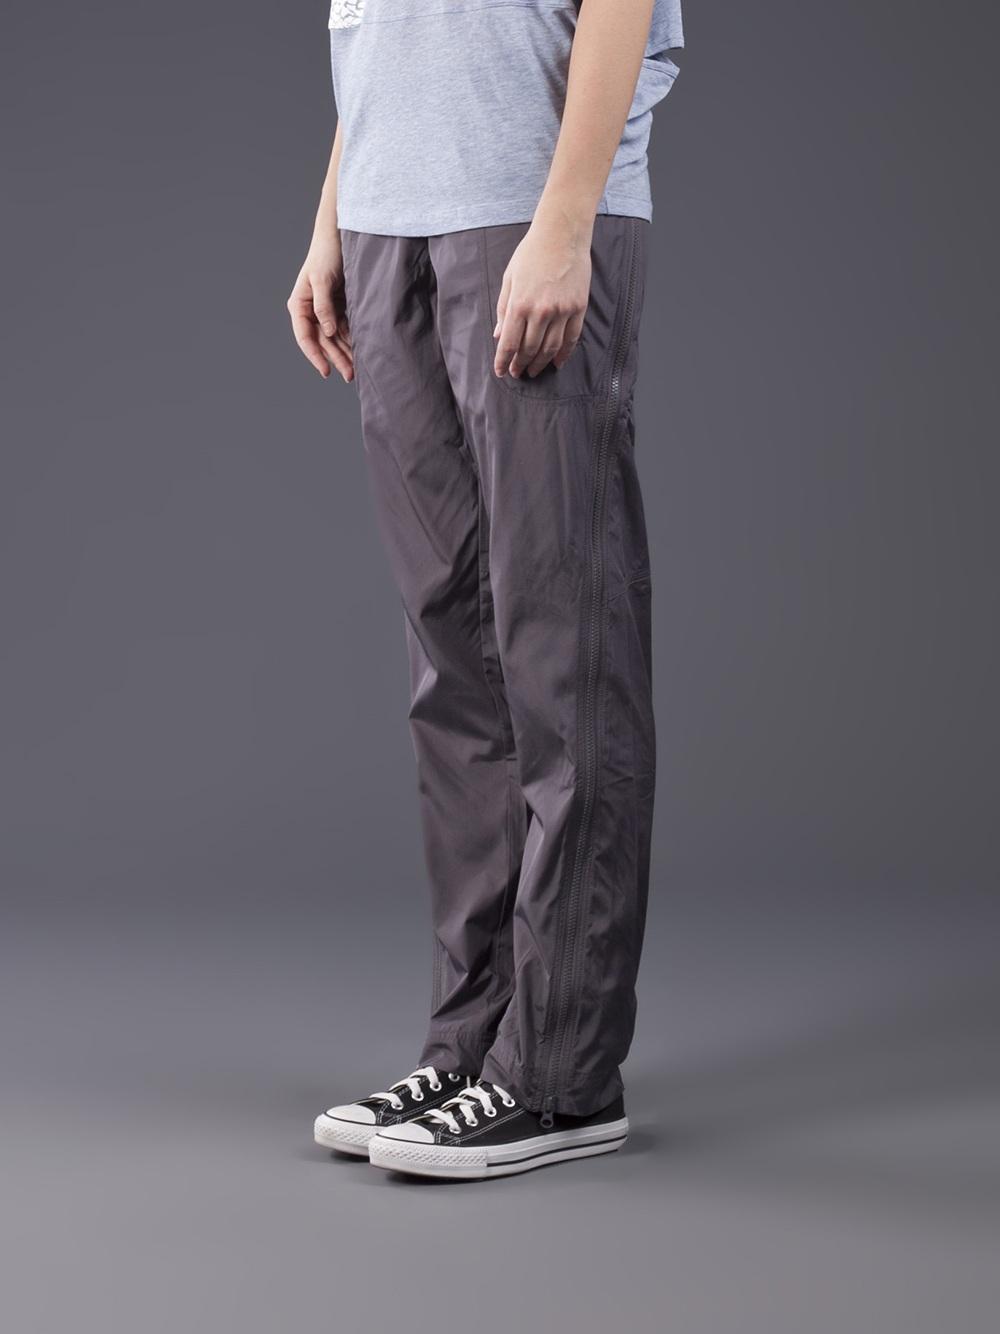 Adidas Stella McCartney Pants Studio Woven in Charcoal Gray Profile View